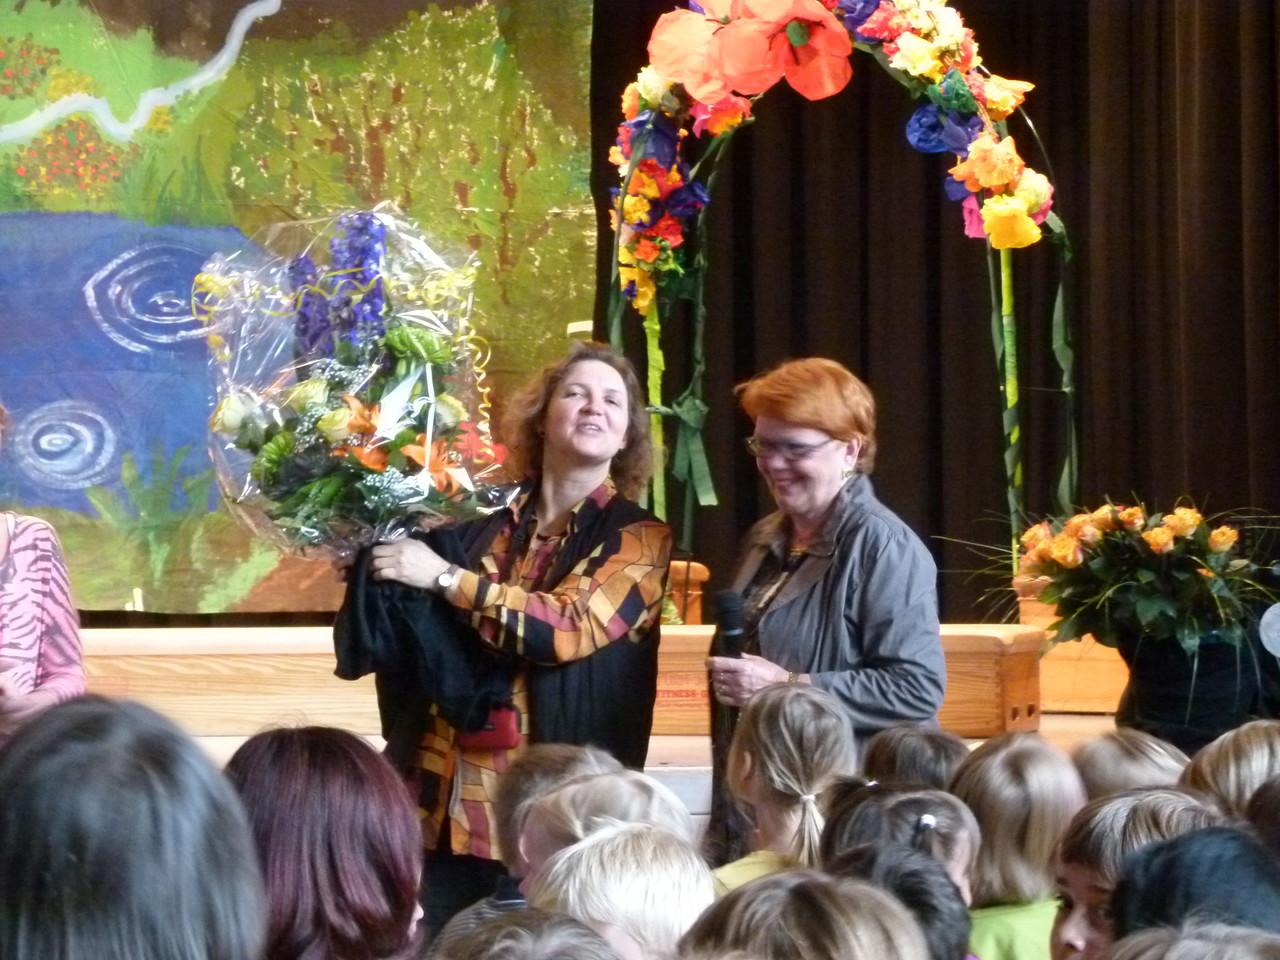 Dankeschön an Frau Karen Seekamp-Schnieder, langjährige Vorsitzende des Förderverins